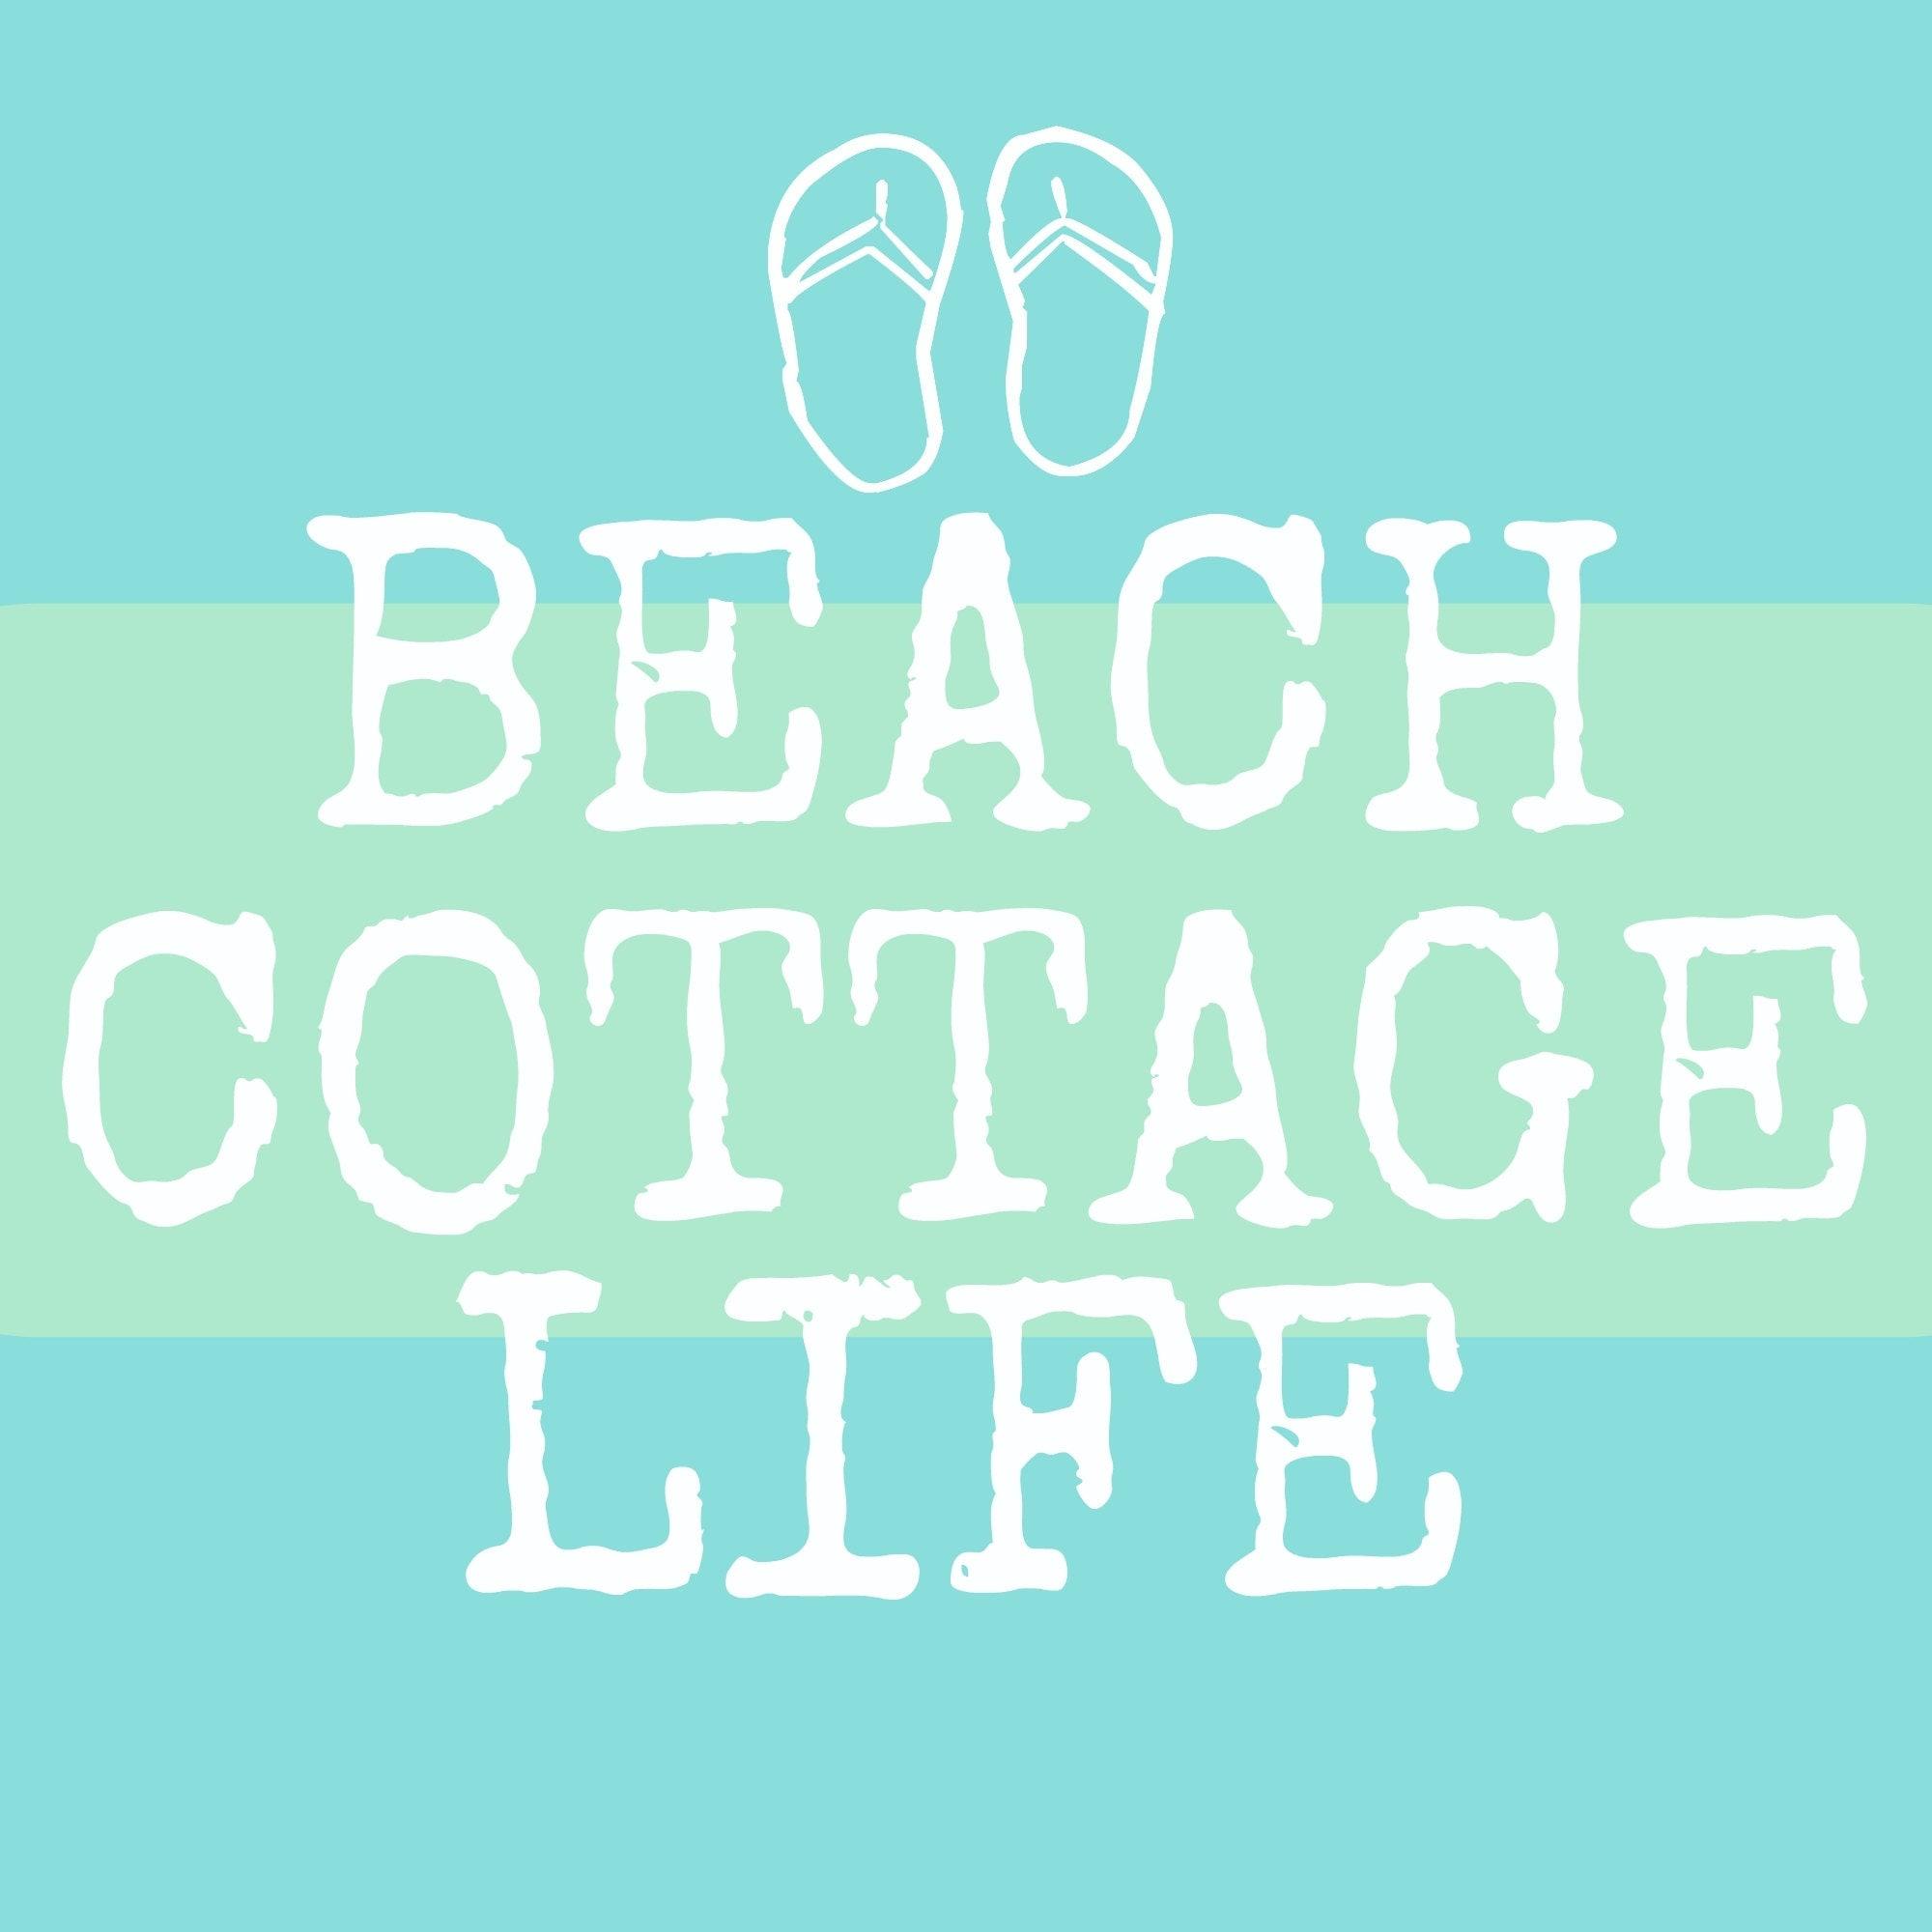 BeachCottageLife